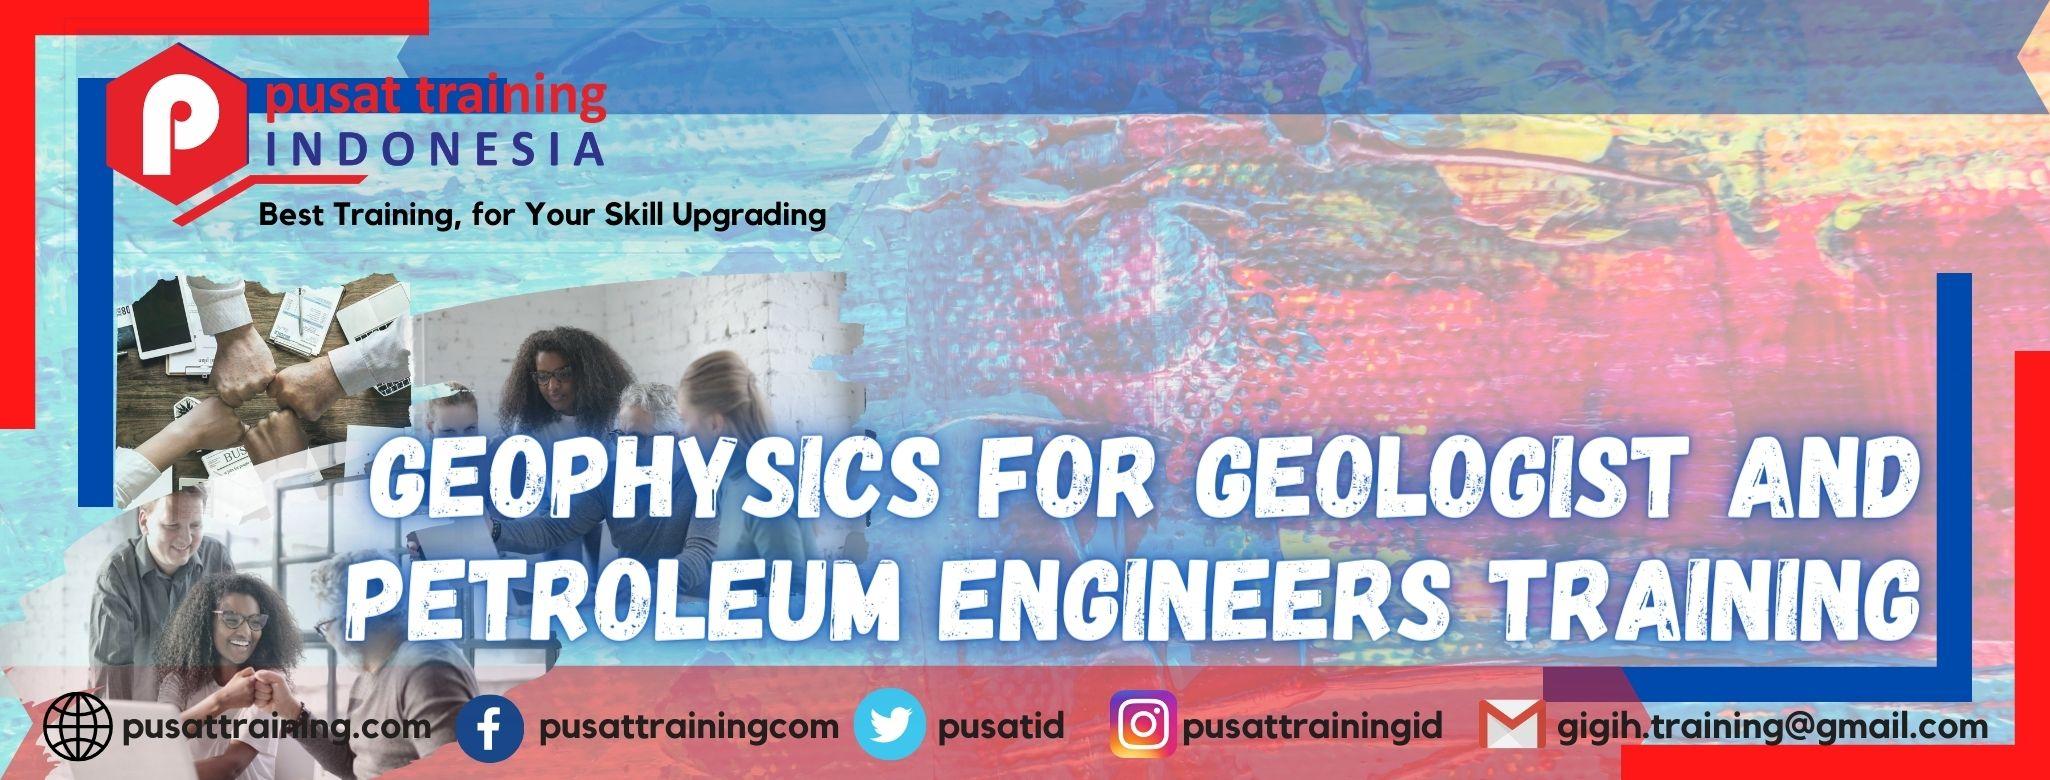 geophysics-for-geologist-abd-petroleum-engineers